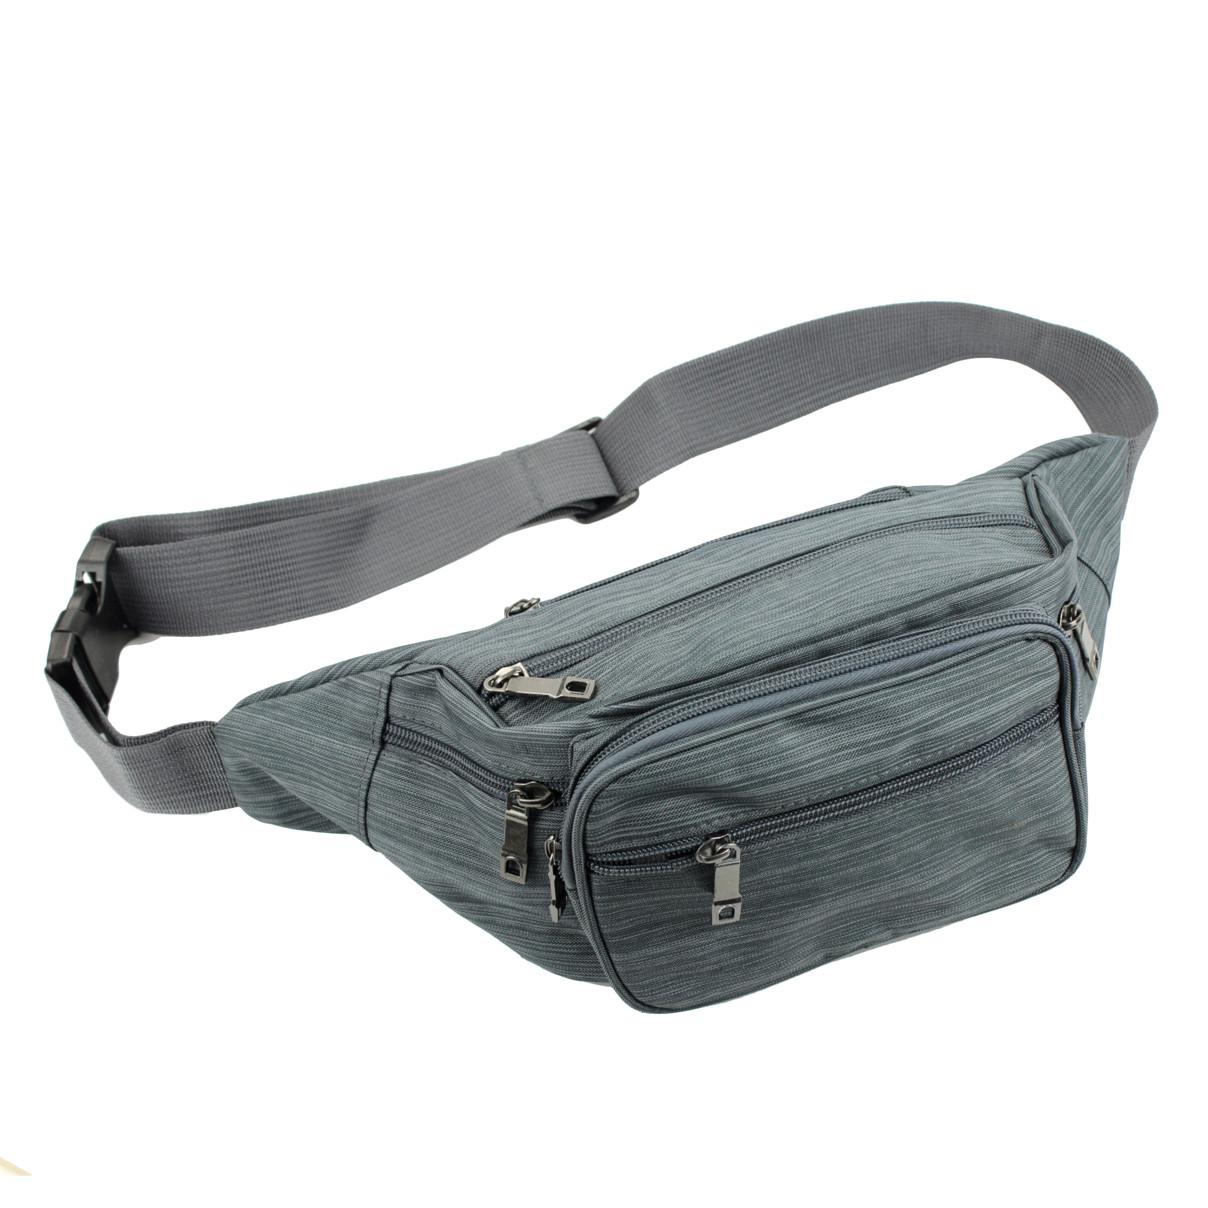 Поясная сумка-бананка текстильная унисекс, Серый